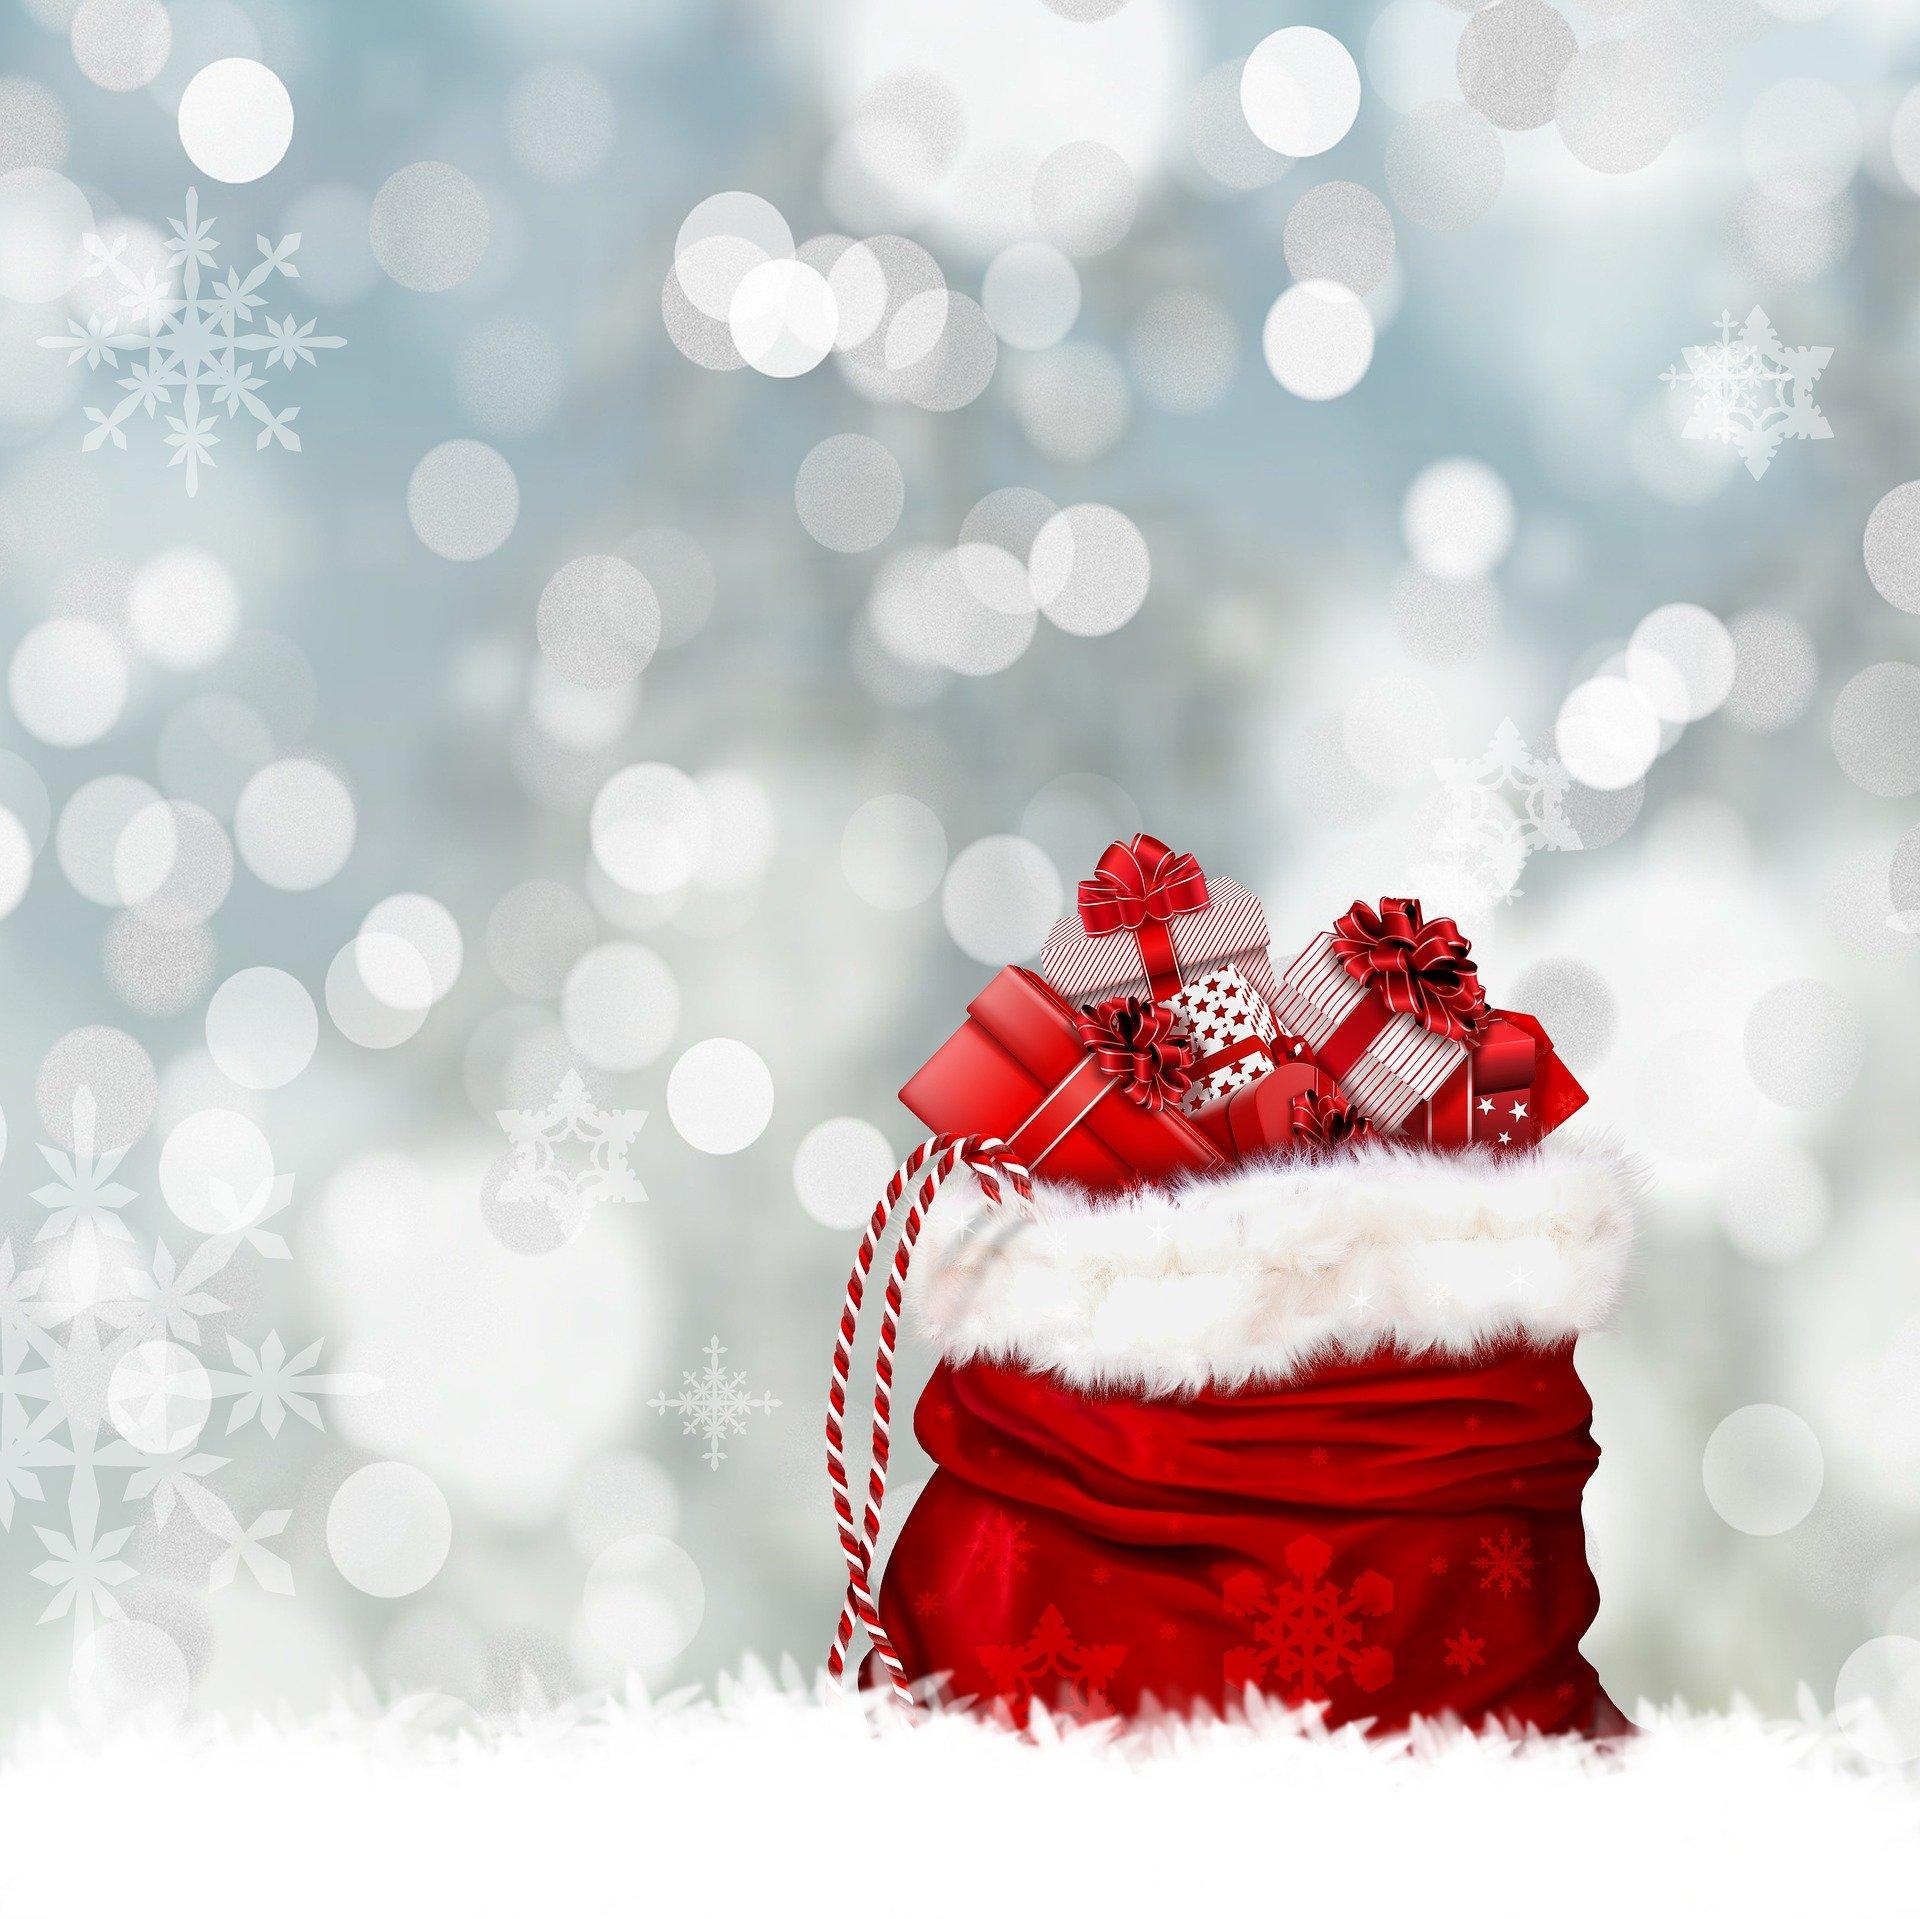 Santa Claus Village in Rovaniemi: Winter Activities